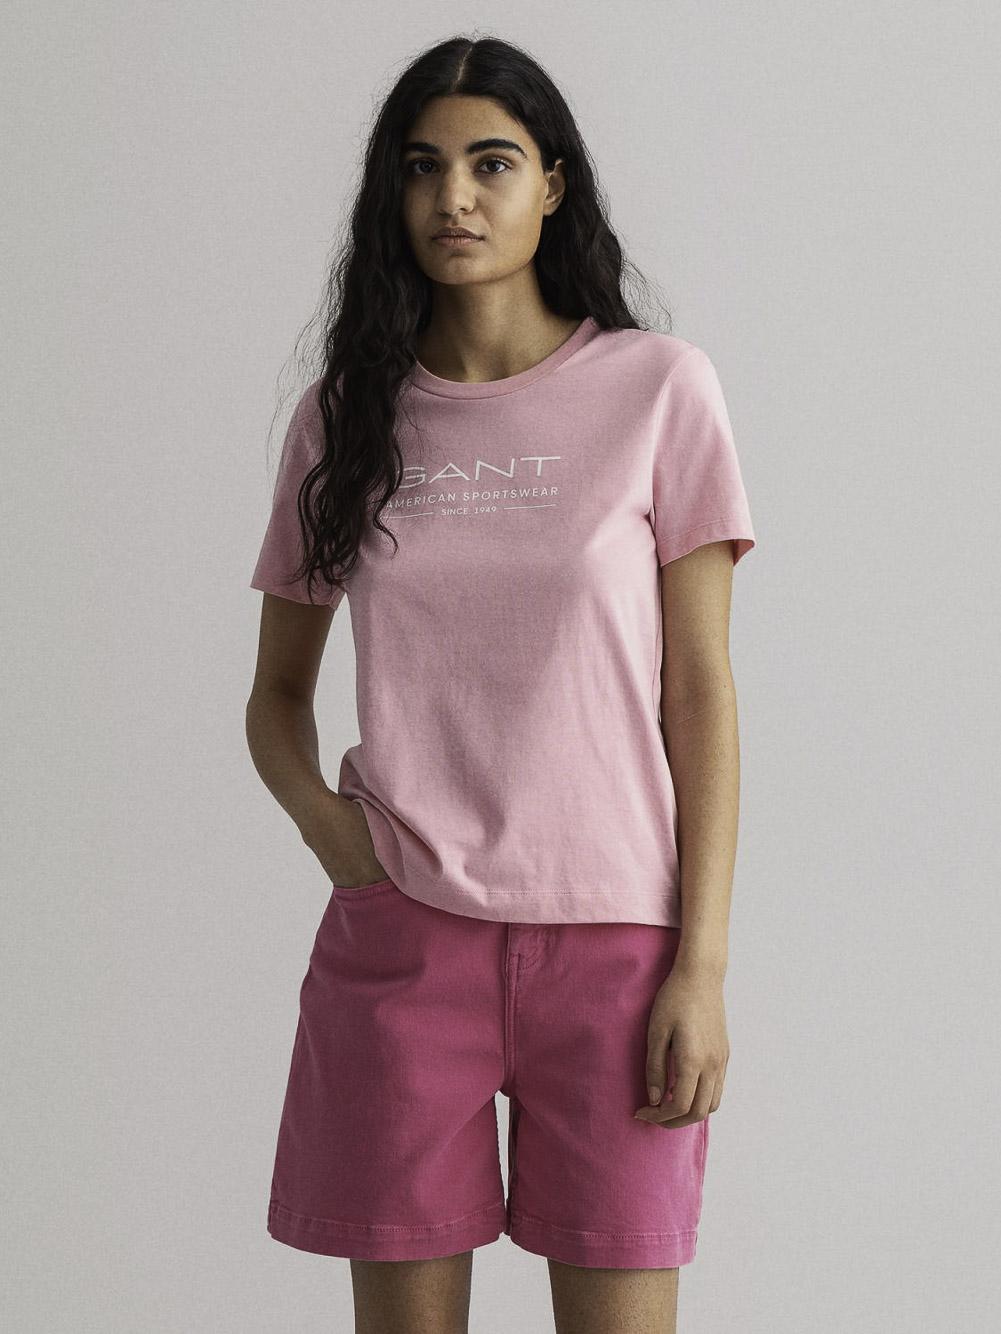 GANT Μπλούζα t-shirt 3GW4200445-667 ΦΟΥΞΙΑ